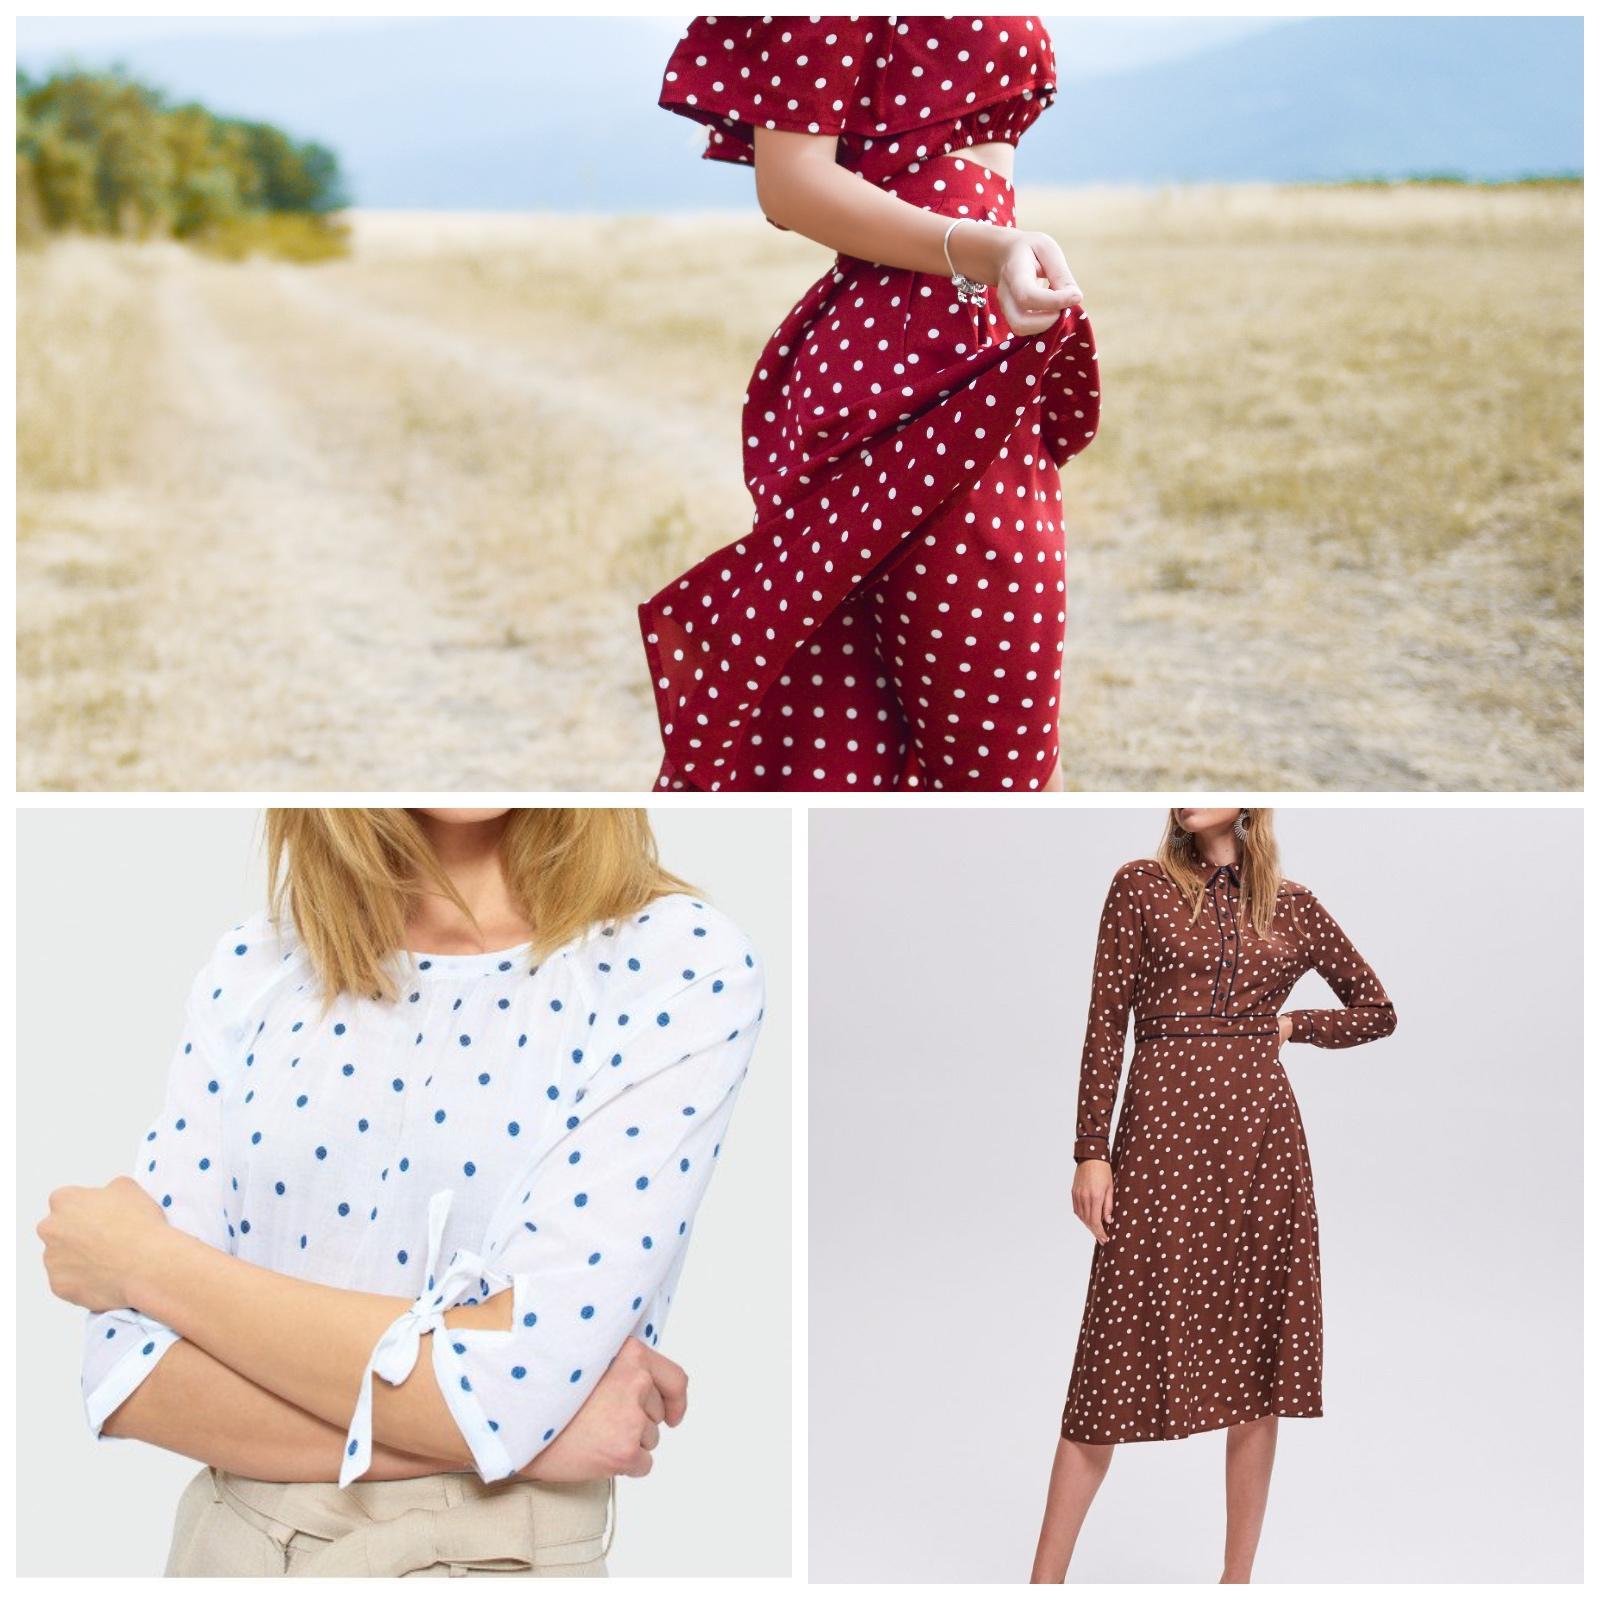 GROSZKI modne Trendy wiosna lato 2019